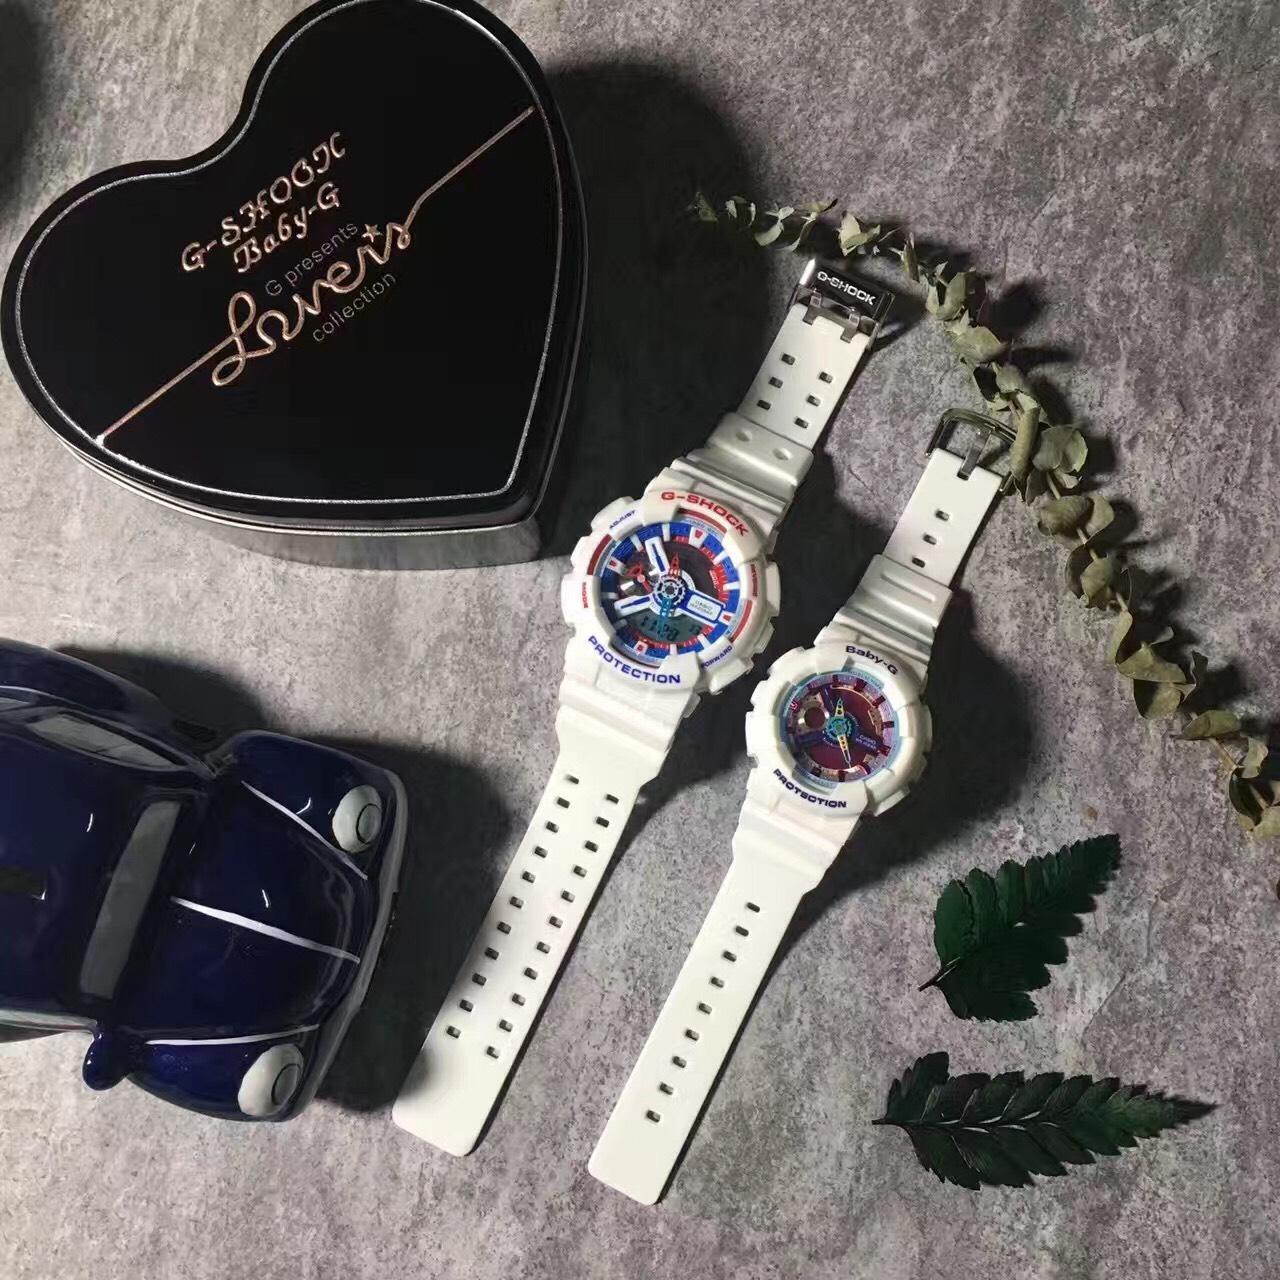 國外代購CASIO G-SHOCK GA110GB & BABY-G BA112-7A 情侶對錶 雙顯 防水手錶